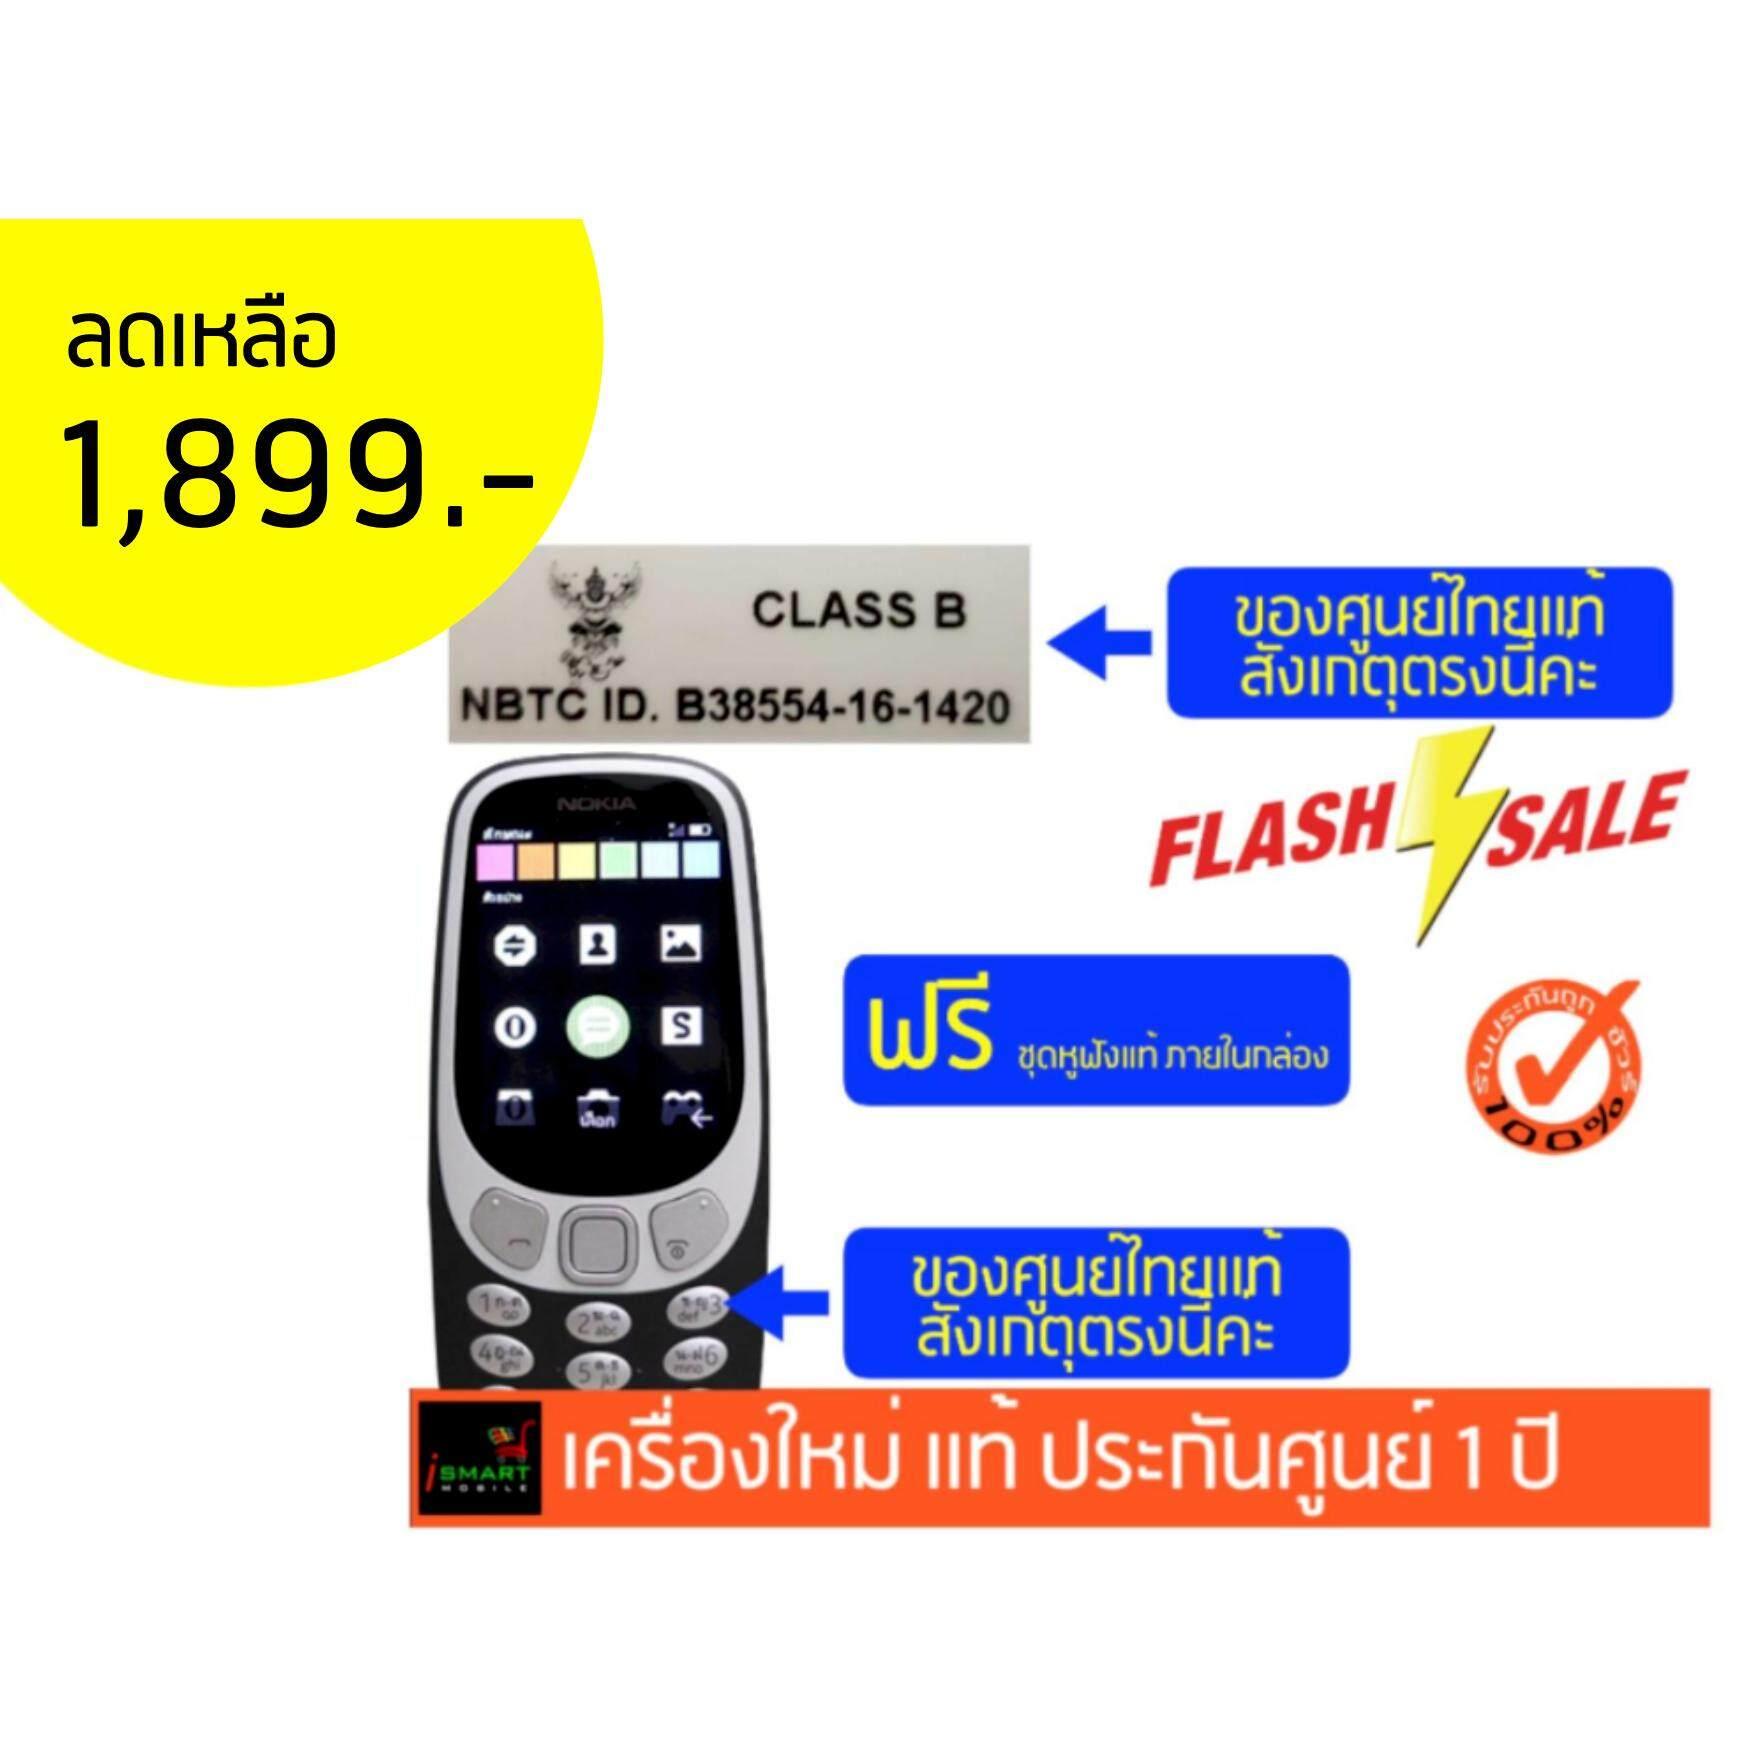 Nokia 3310 3G แท้ ฟรี Smalltalk แท้ ลดเหลือ 1,899 บาท กดโค๊ต ismart10 พร้อมส่งฟรี!